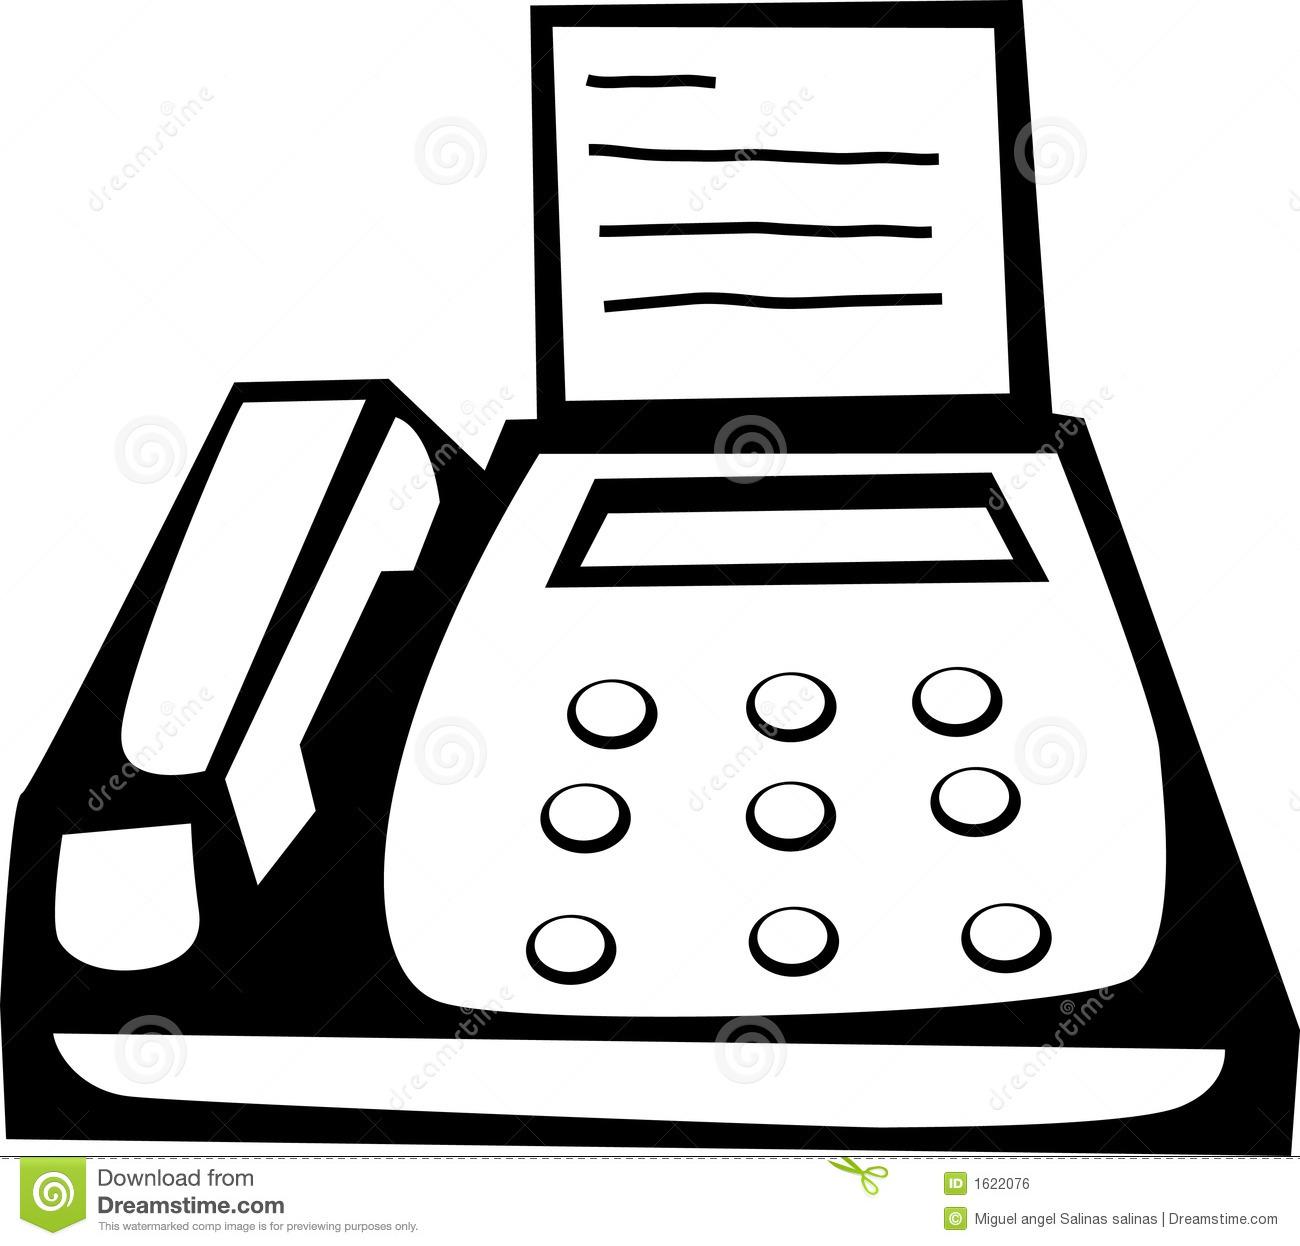 Fax machine vector.